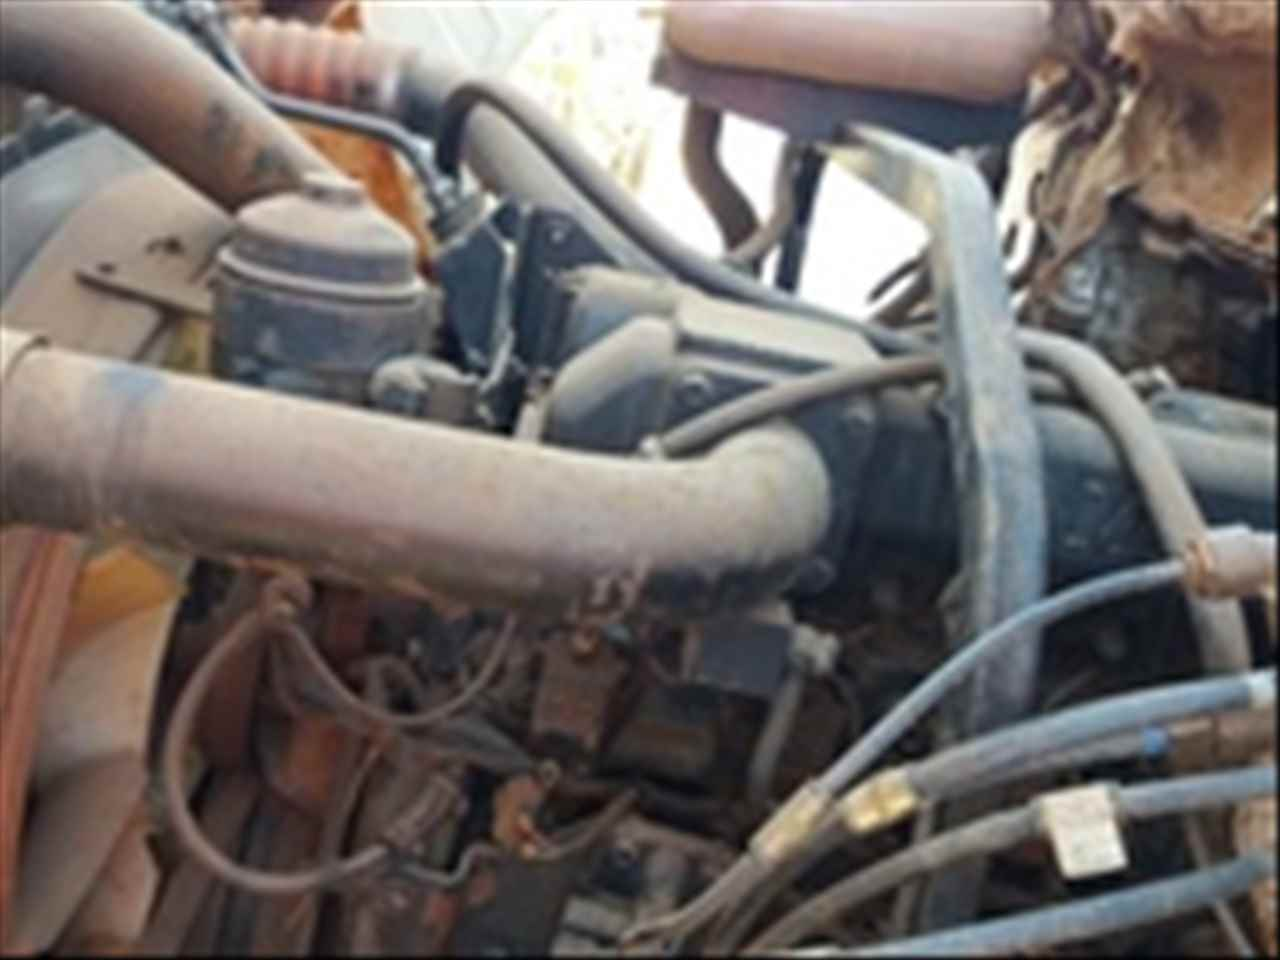 crissiumal%2frs%2fmotor-mb-1938-motor-mb-366%2fcaminhao%2fda-luz-maquinas%2f11911